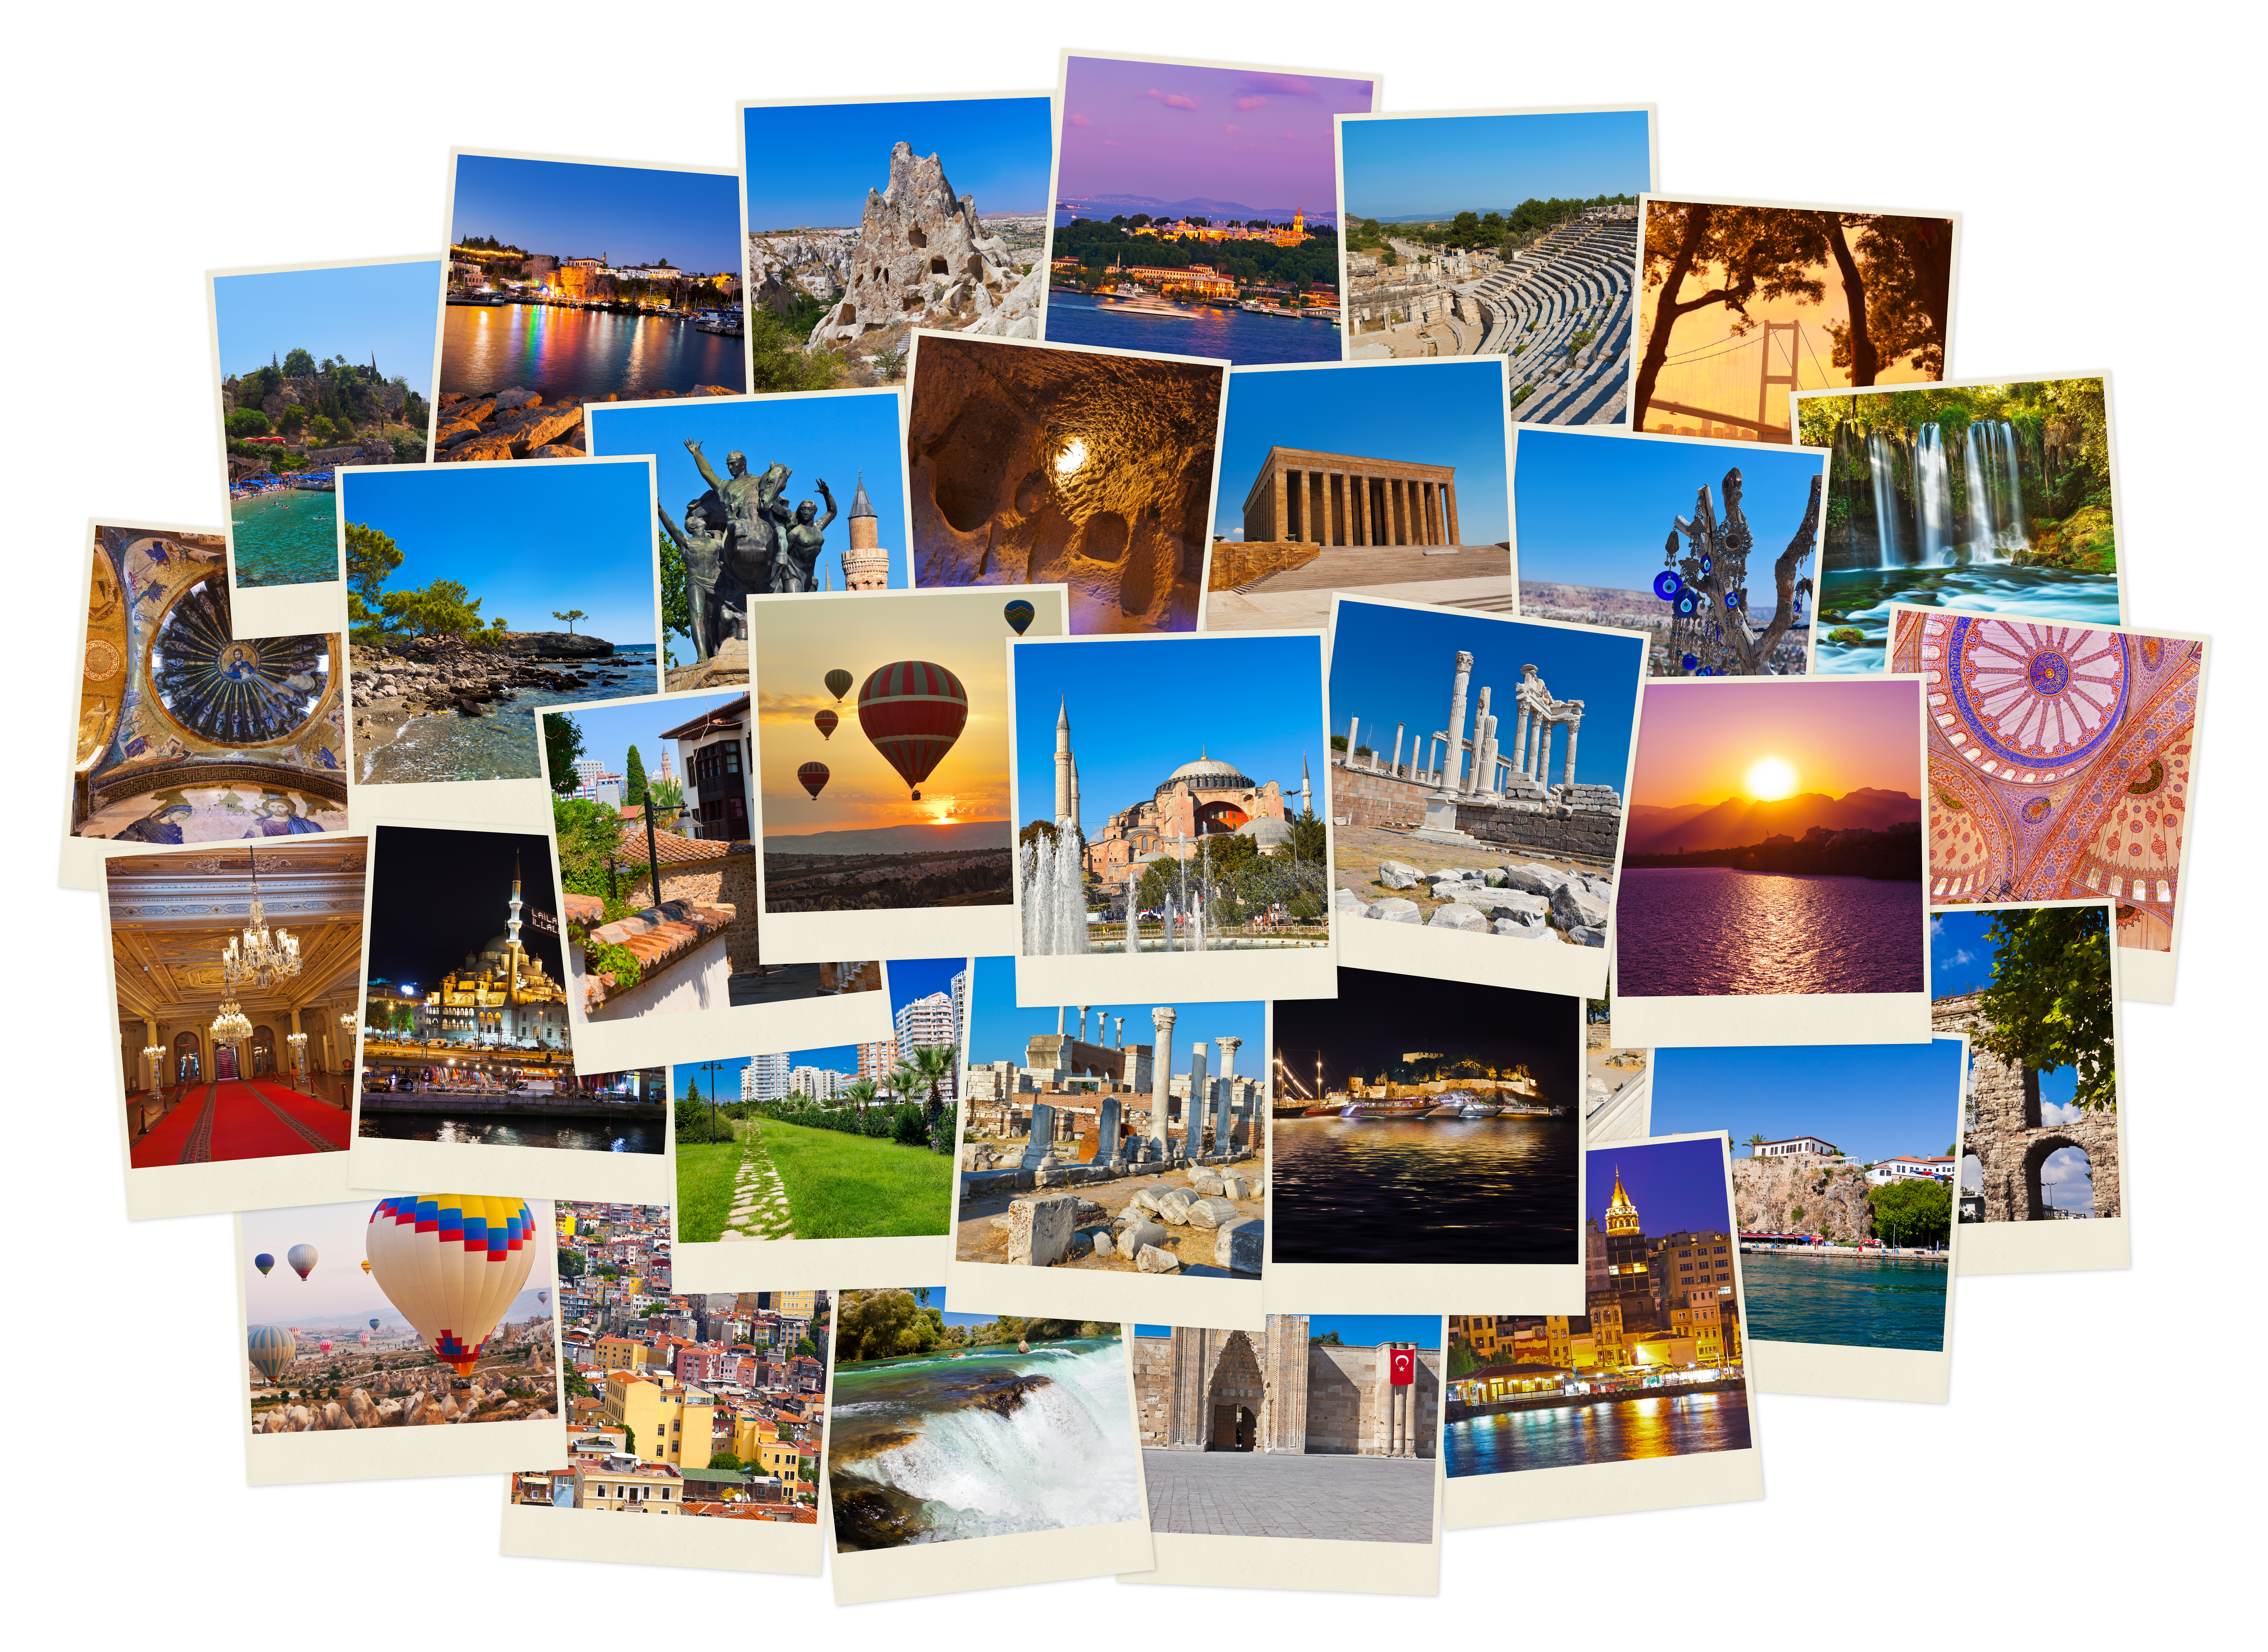 Comment exporter vos photographies Instagram vers Google+